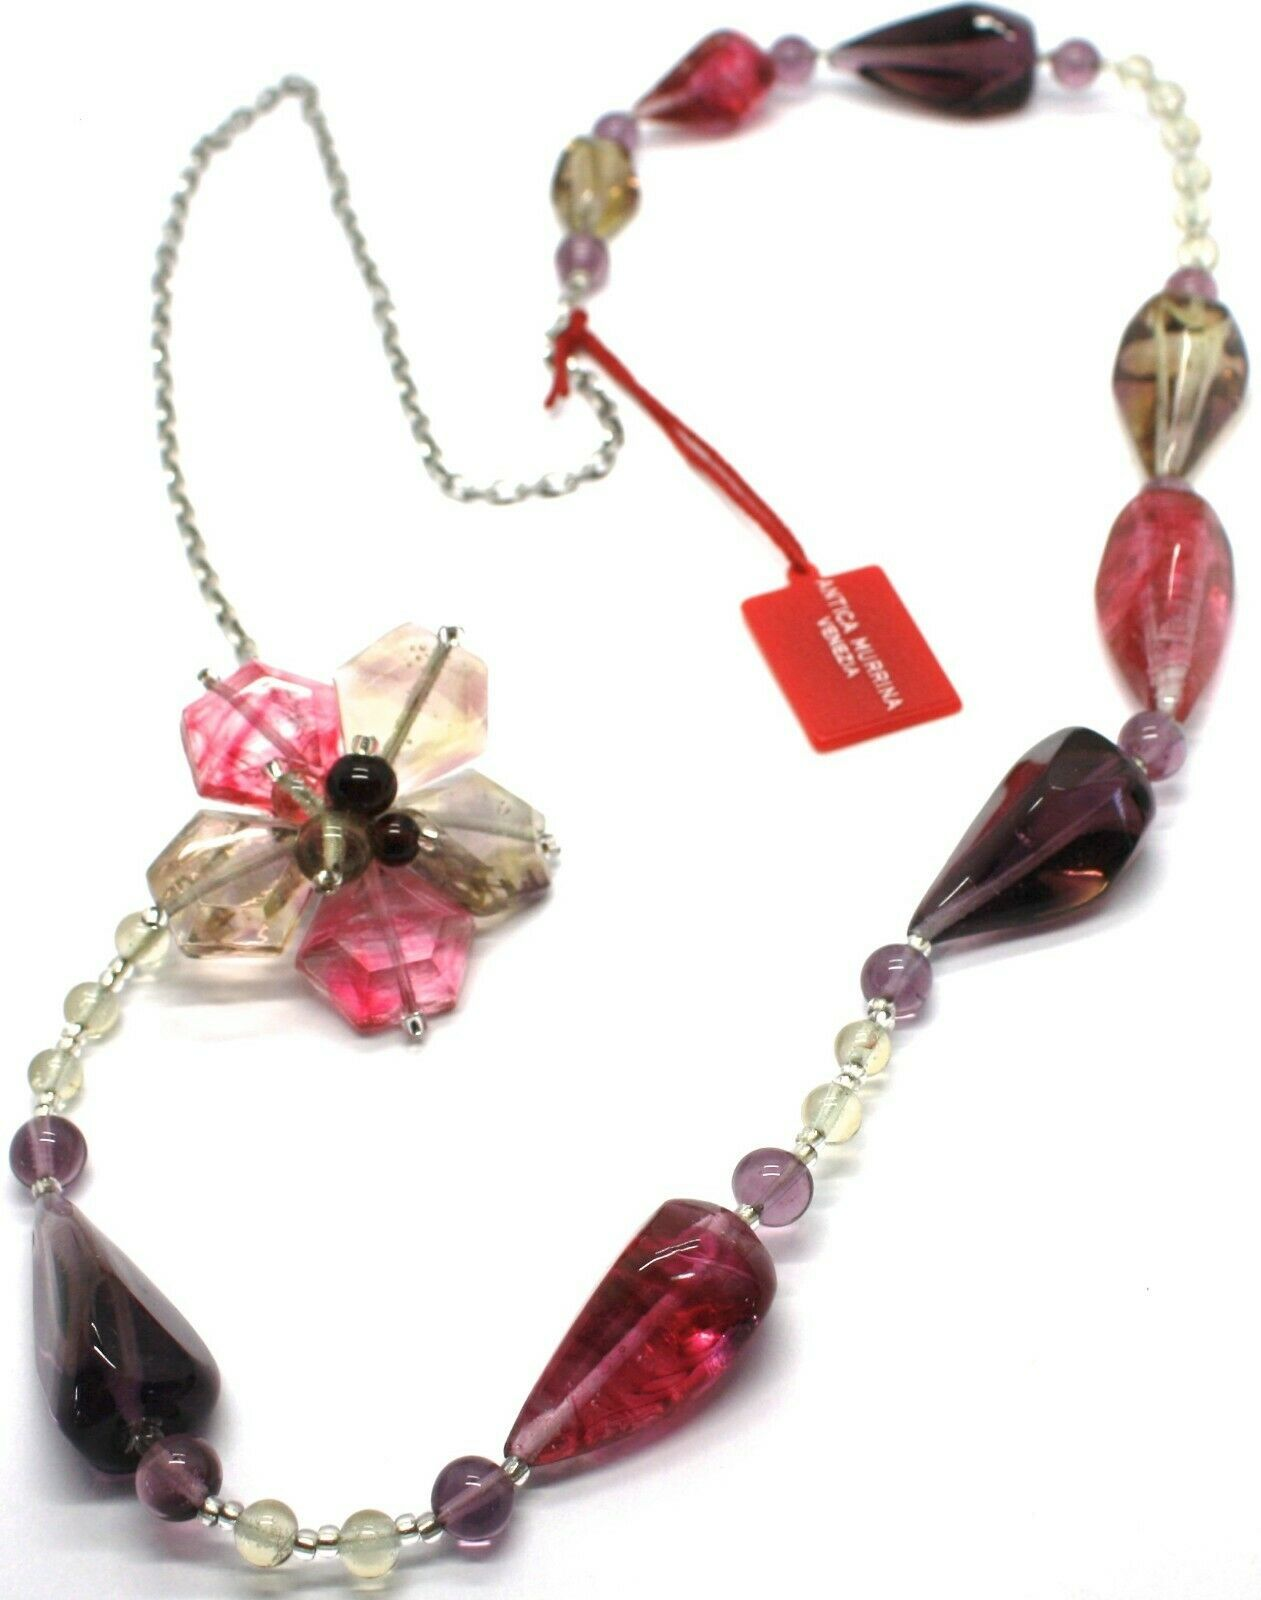 Necklace Antica Murrina Venezia, Glass Murano, 90 cm, CO561A29, Flower Drops Red